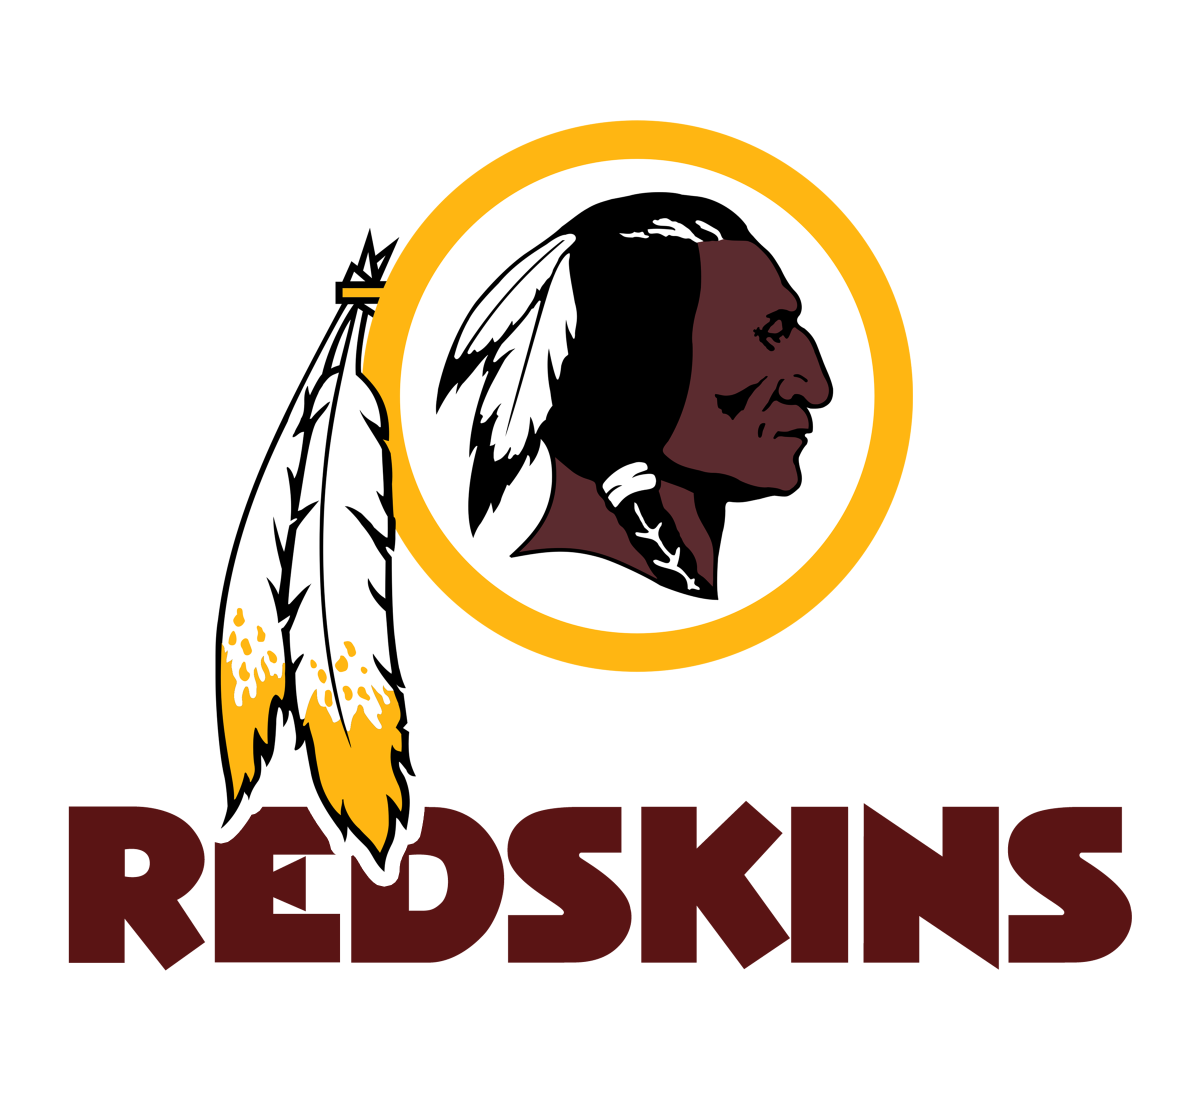 In 1992, the Washington Redskins won Super Bowl XXVI by defeating the Buffalo Bills.